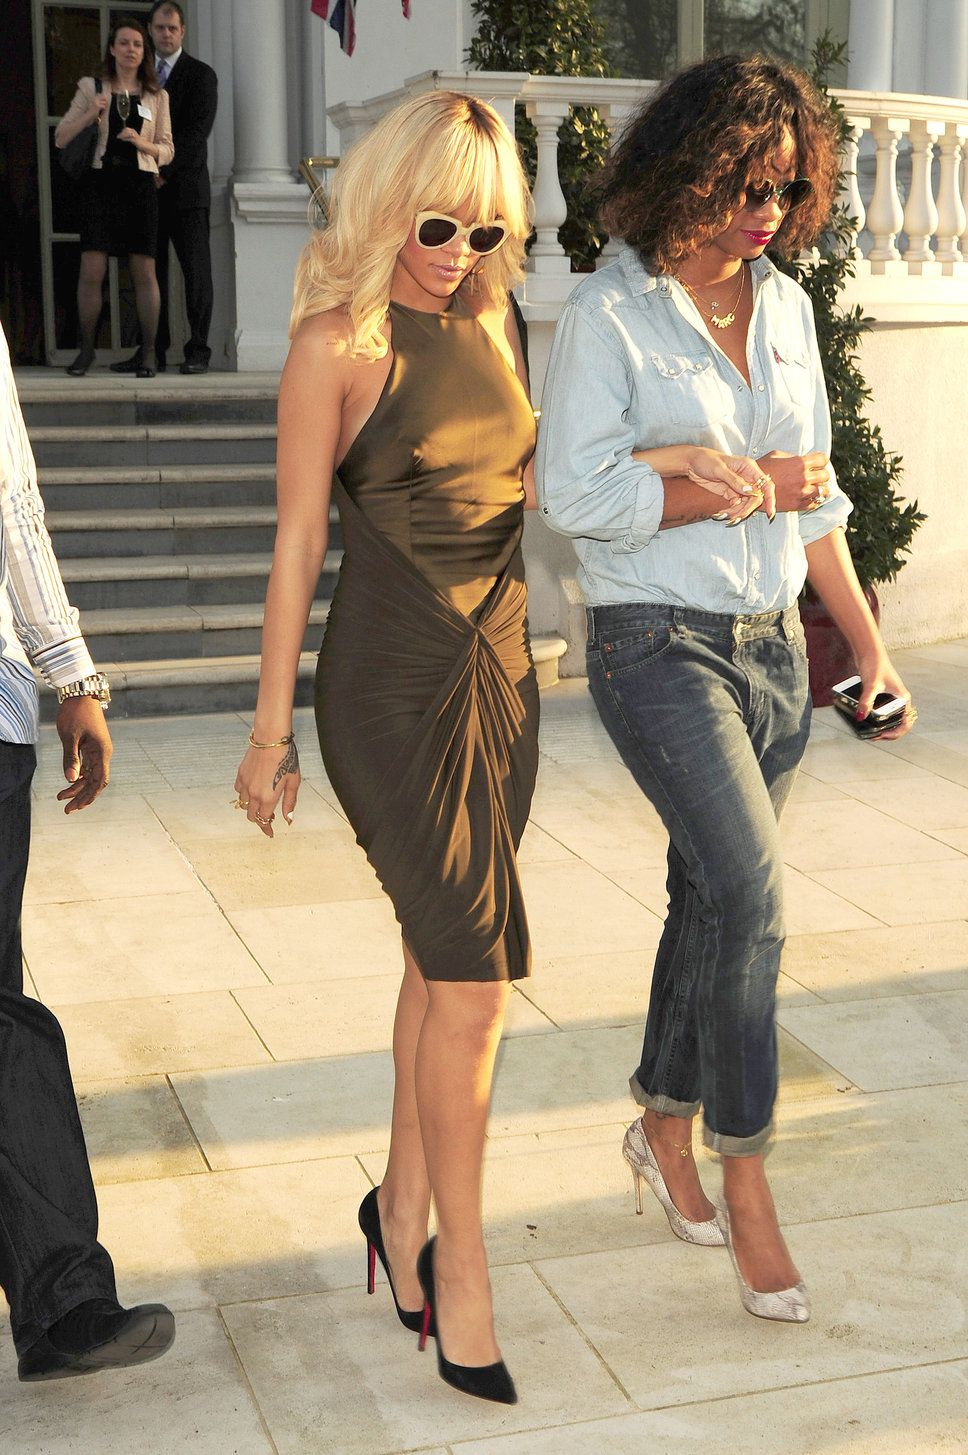 Rihanna Olive Green Dress Google Search Olive Green Dresses Fashion Rihanna Blonde [ 1455 x 968 Pixel ]